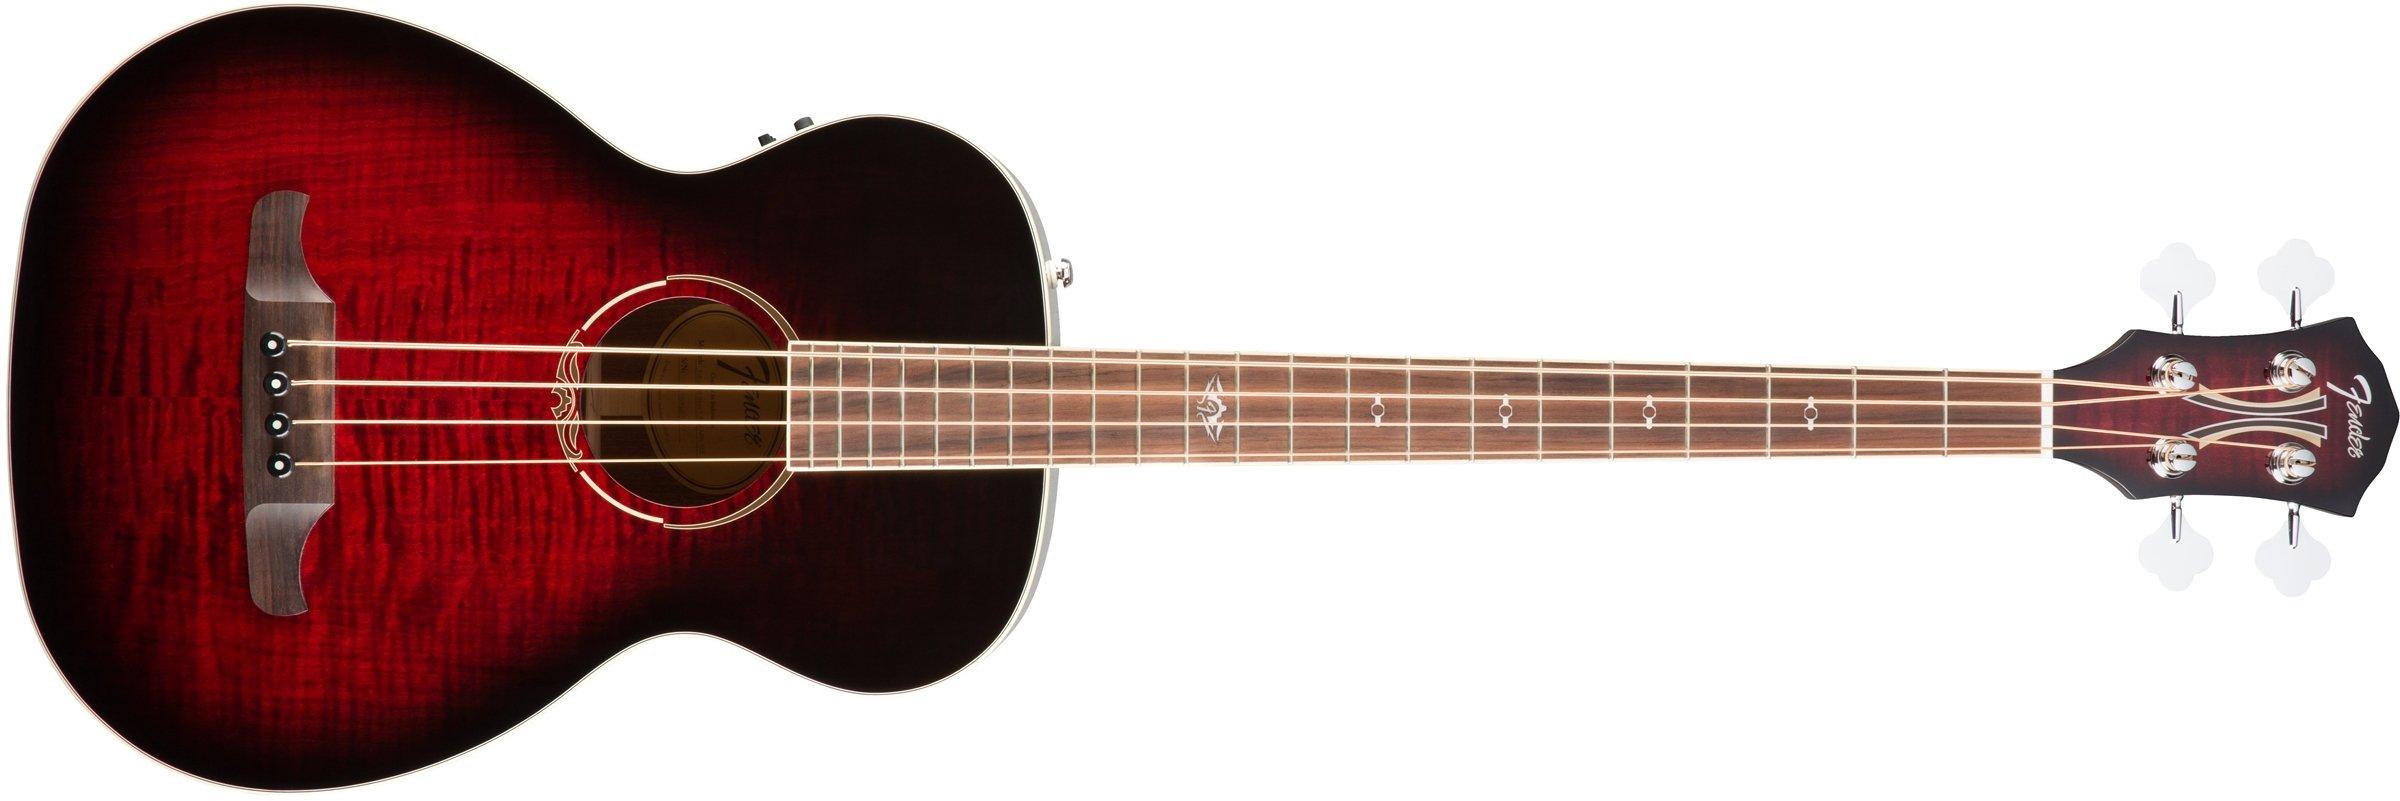 Fender T-Bucket 300 Acoustic Electric Bass Guitar, Rosewood Fingerboard - Trans Cherry Burst